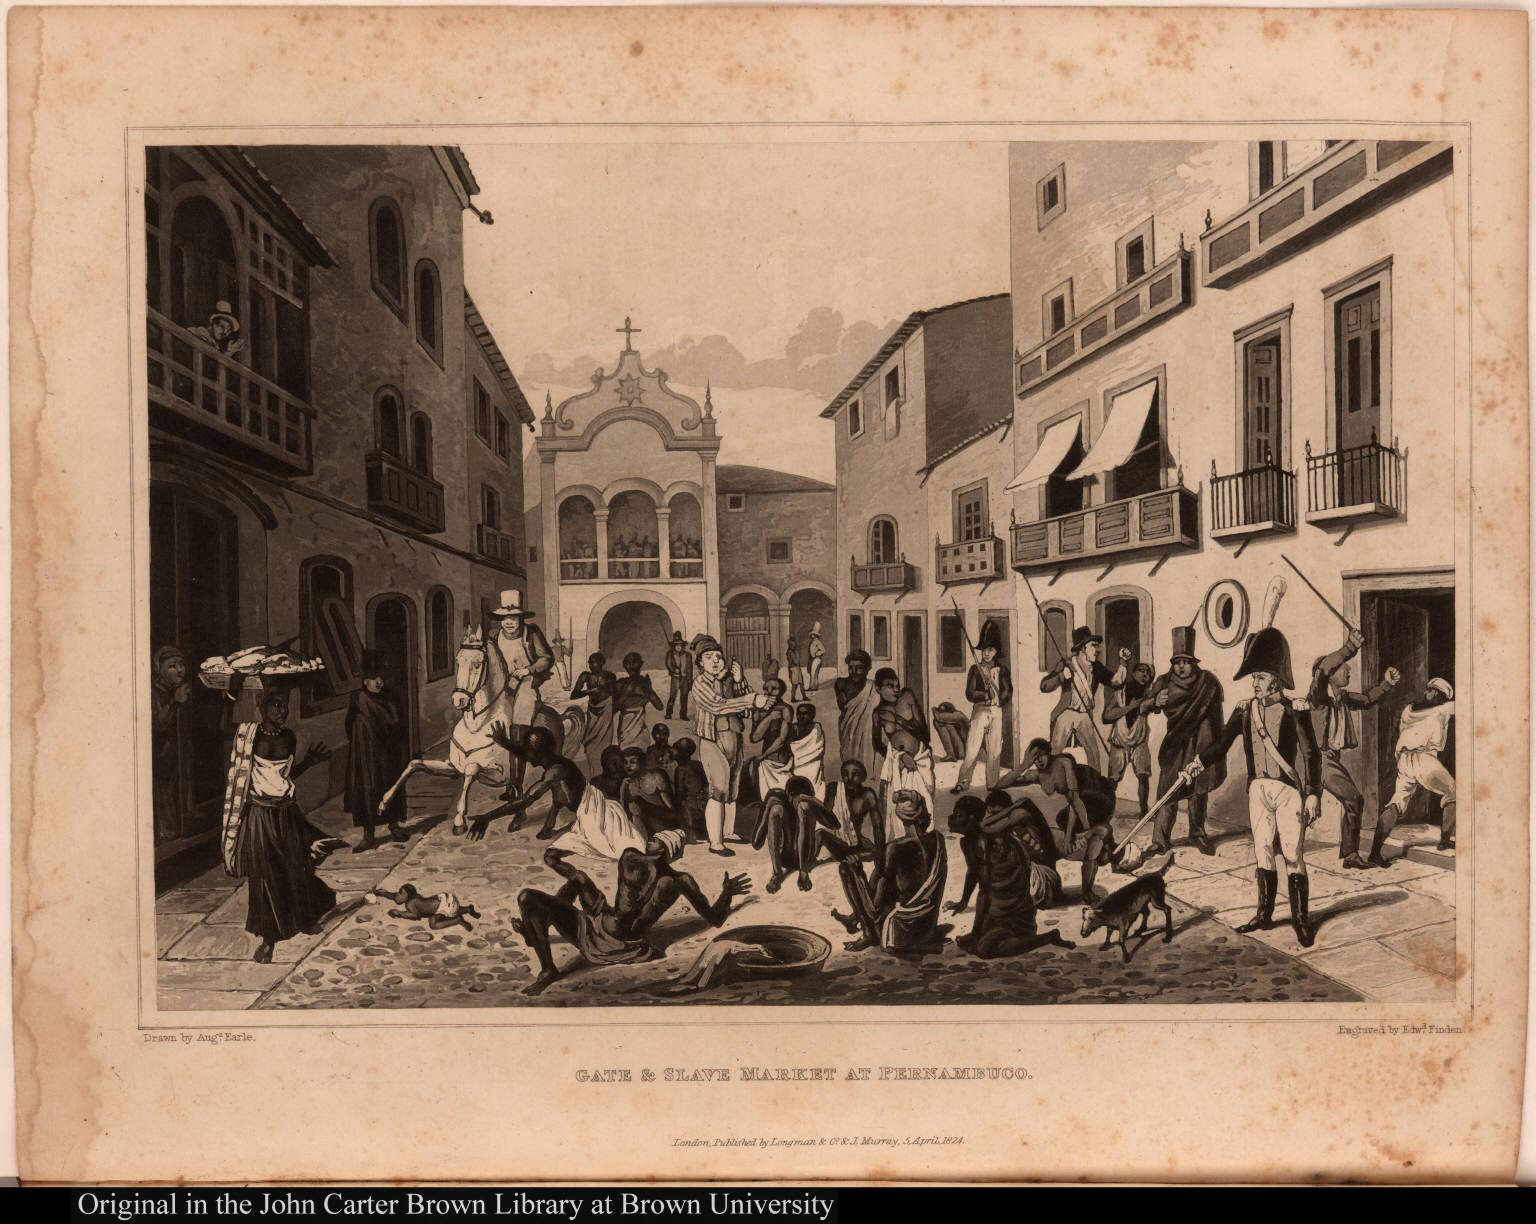 Gate & slave market at Pernambuco.